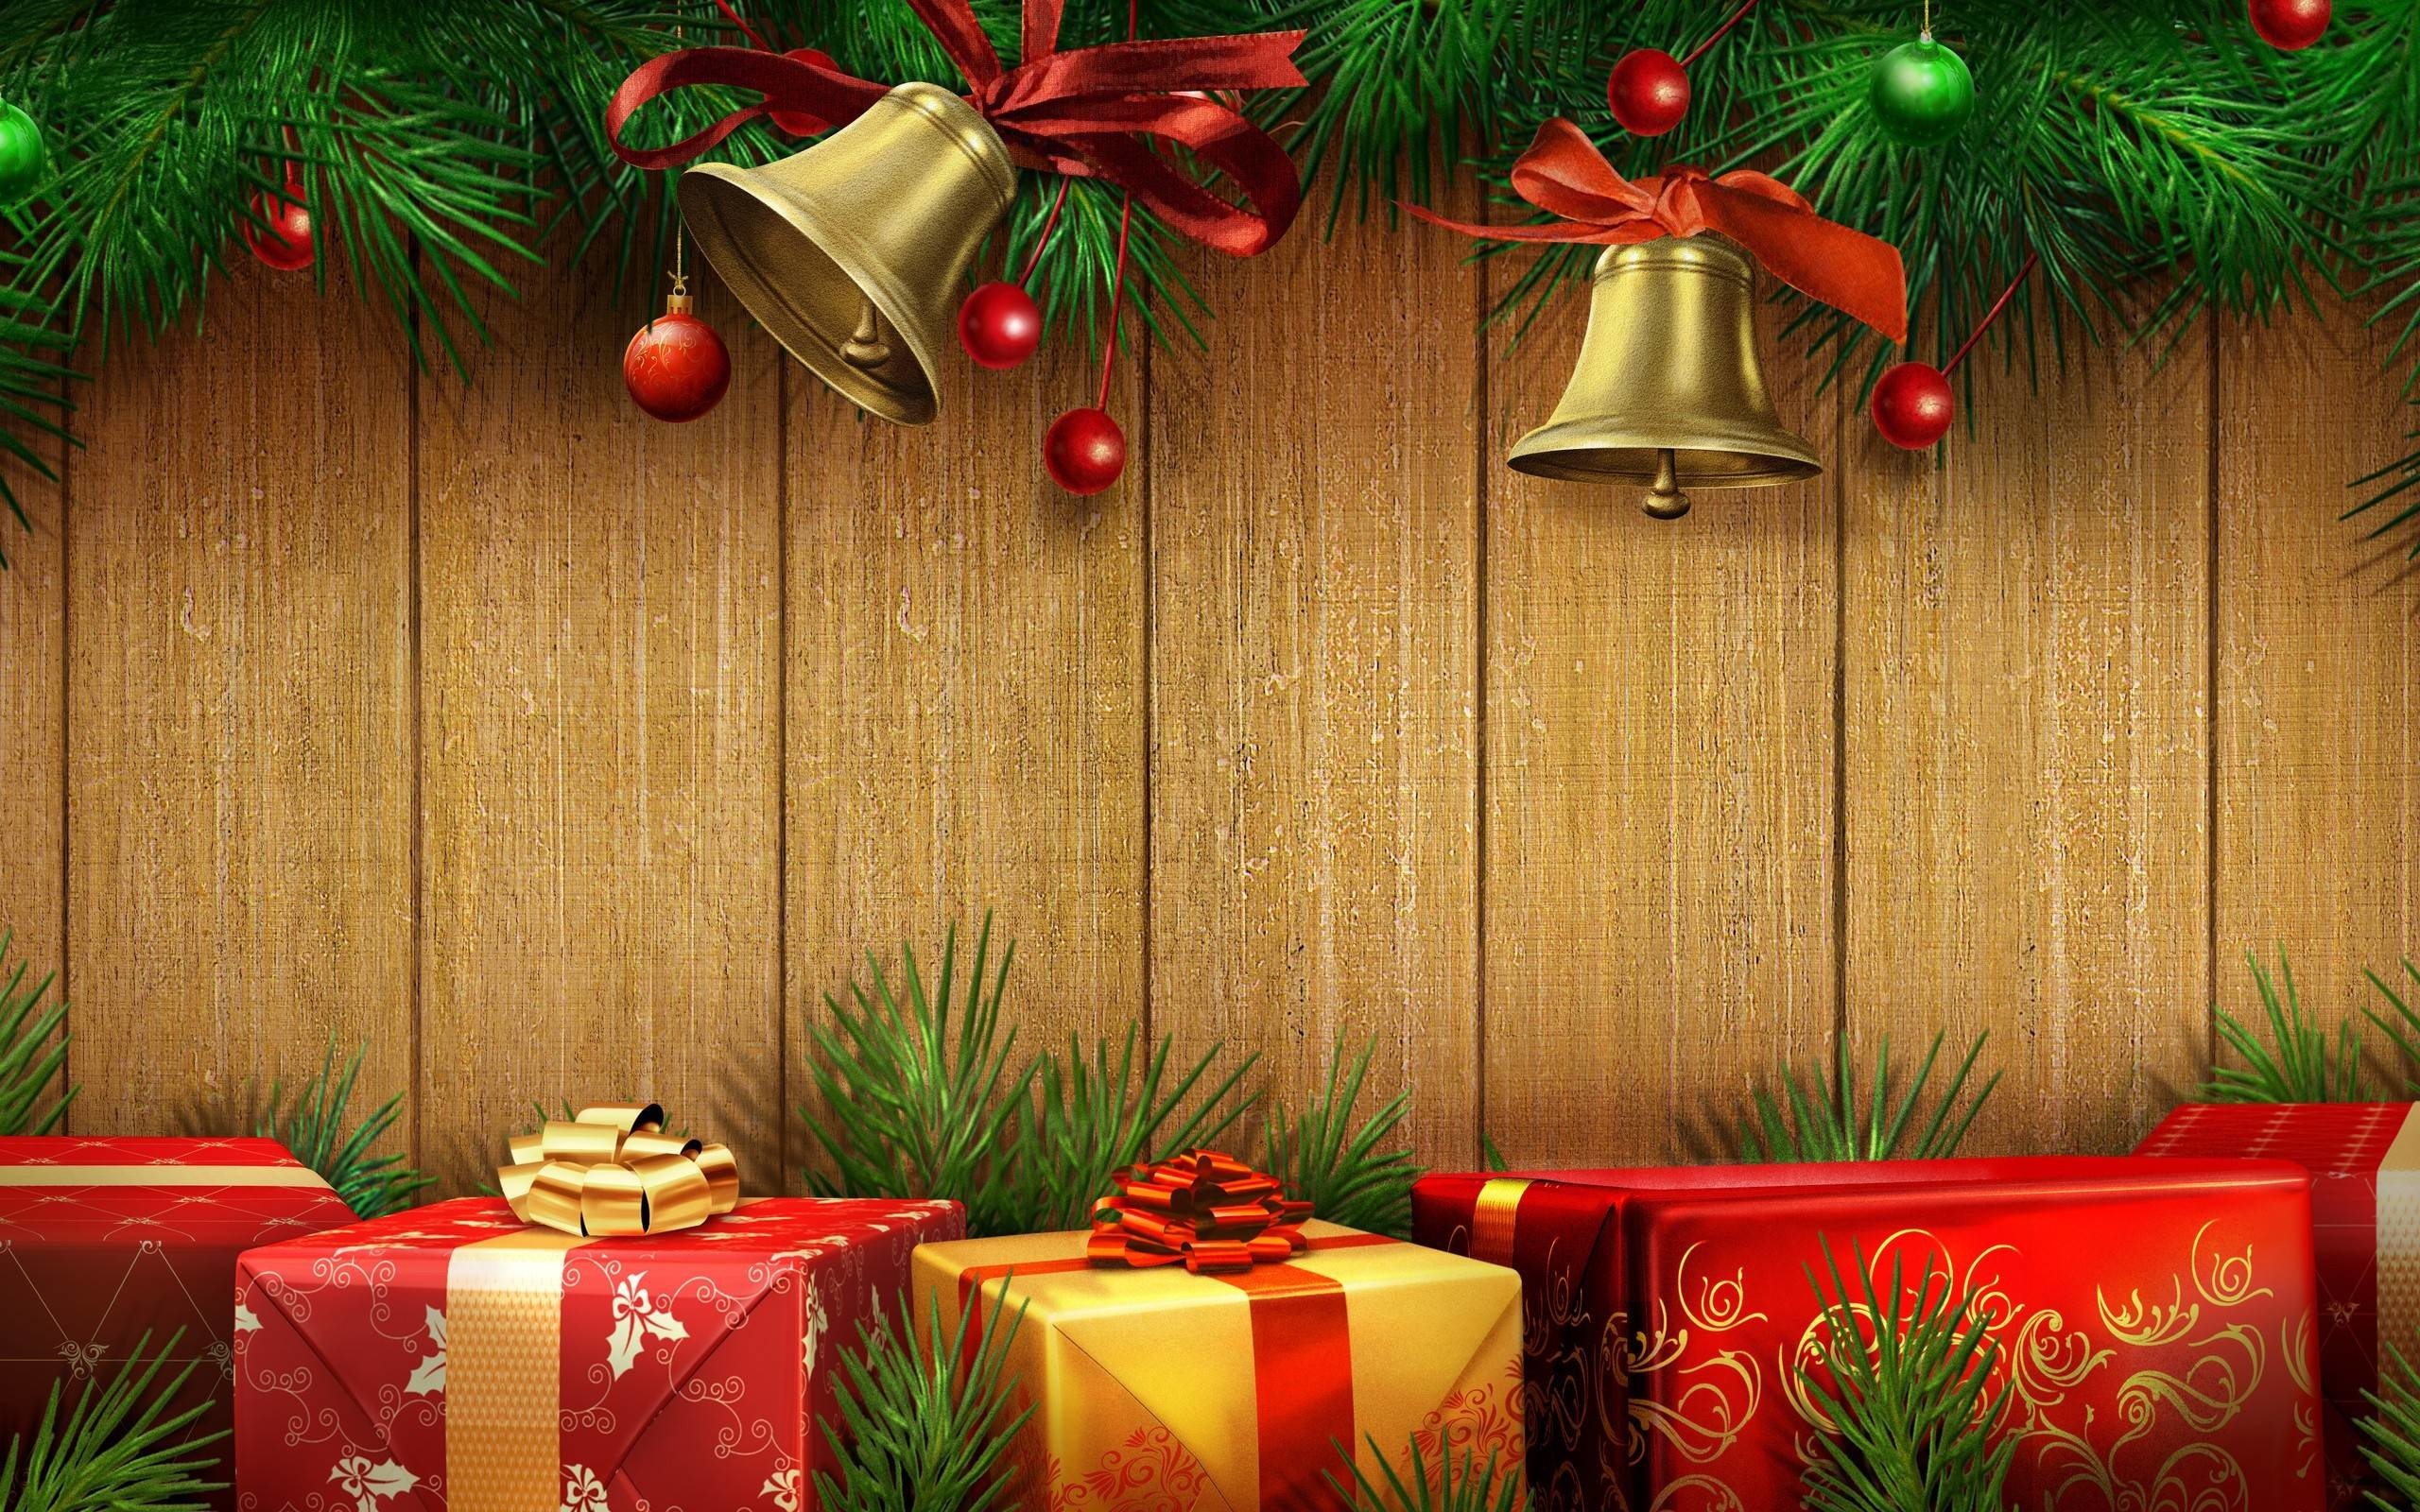 Xmas Stuff For Christmas Gifts Wallpaper Christmas Gift Background 2560x1600 Wallpaper Teahub Io